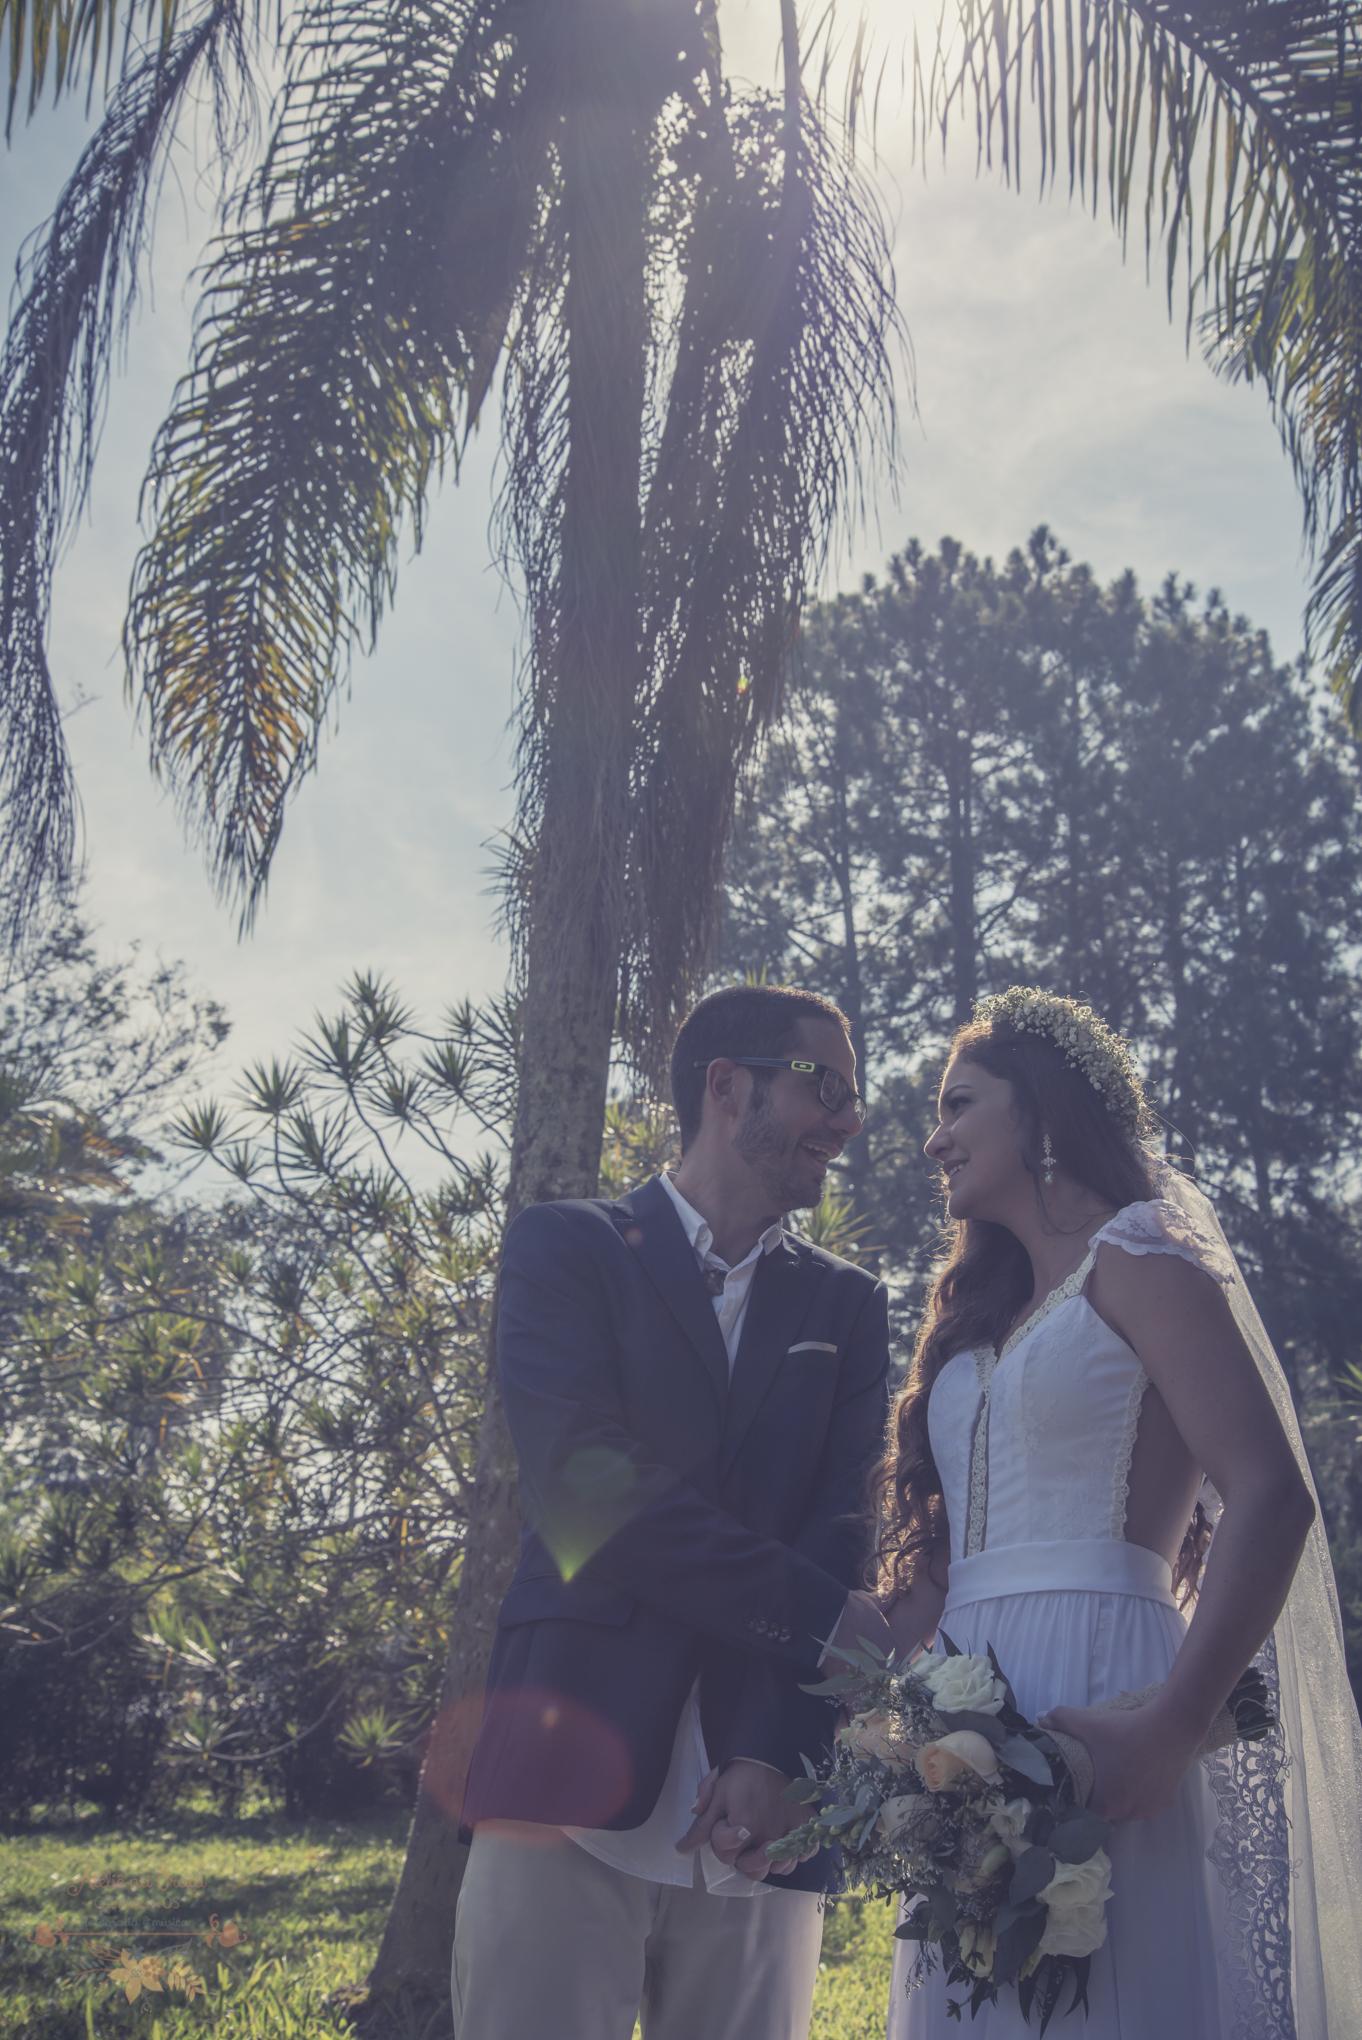 05-EnsaioNoivos-Atelie-na-Praia-Nadine-Carlos-Casamento-6237